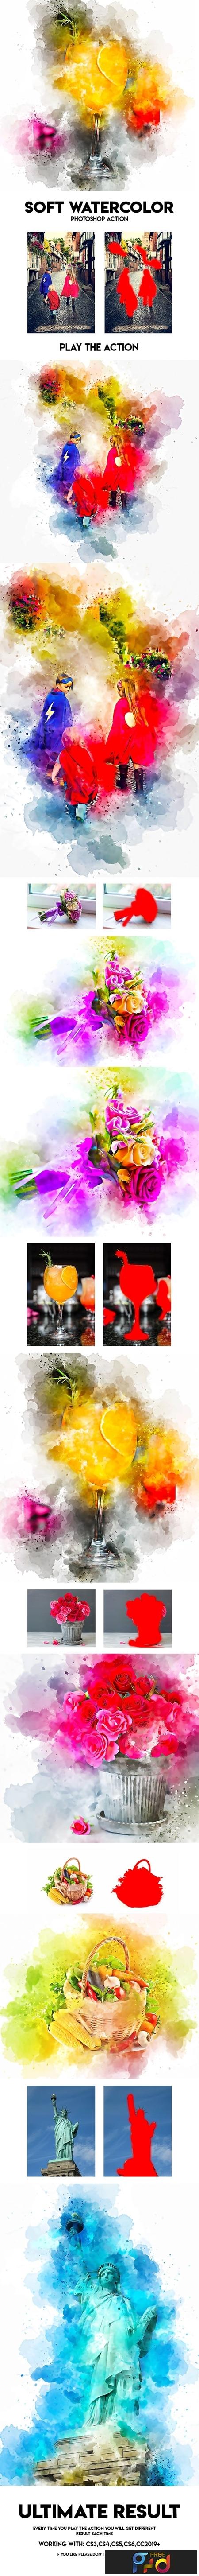 Soft Watercolor Photoshop Action 23799935 1